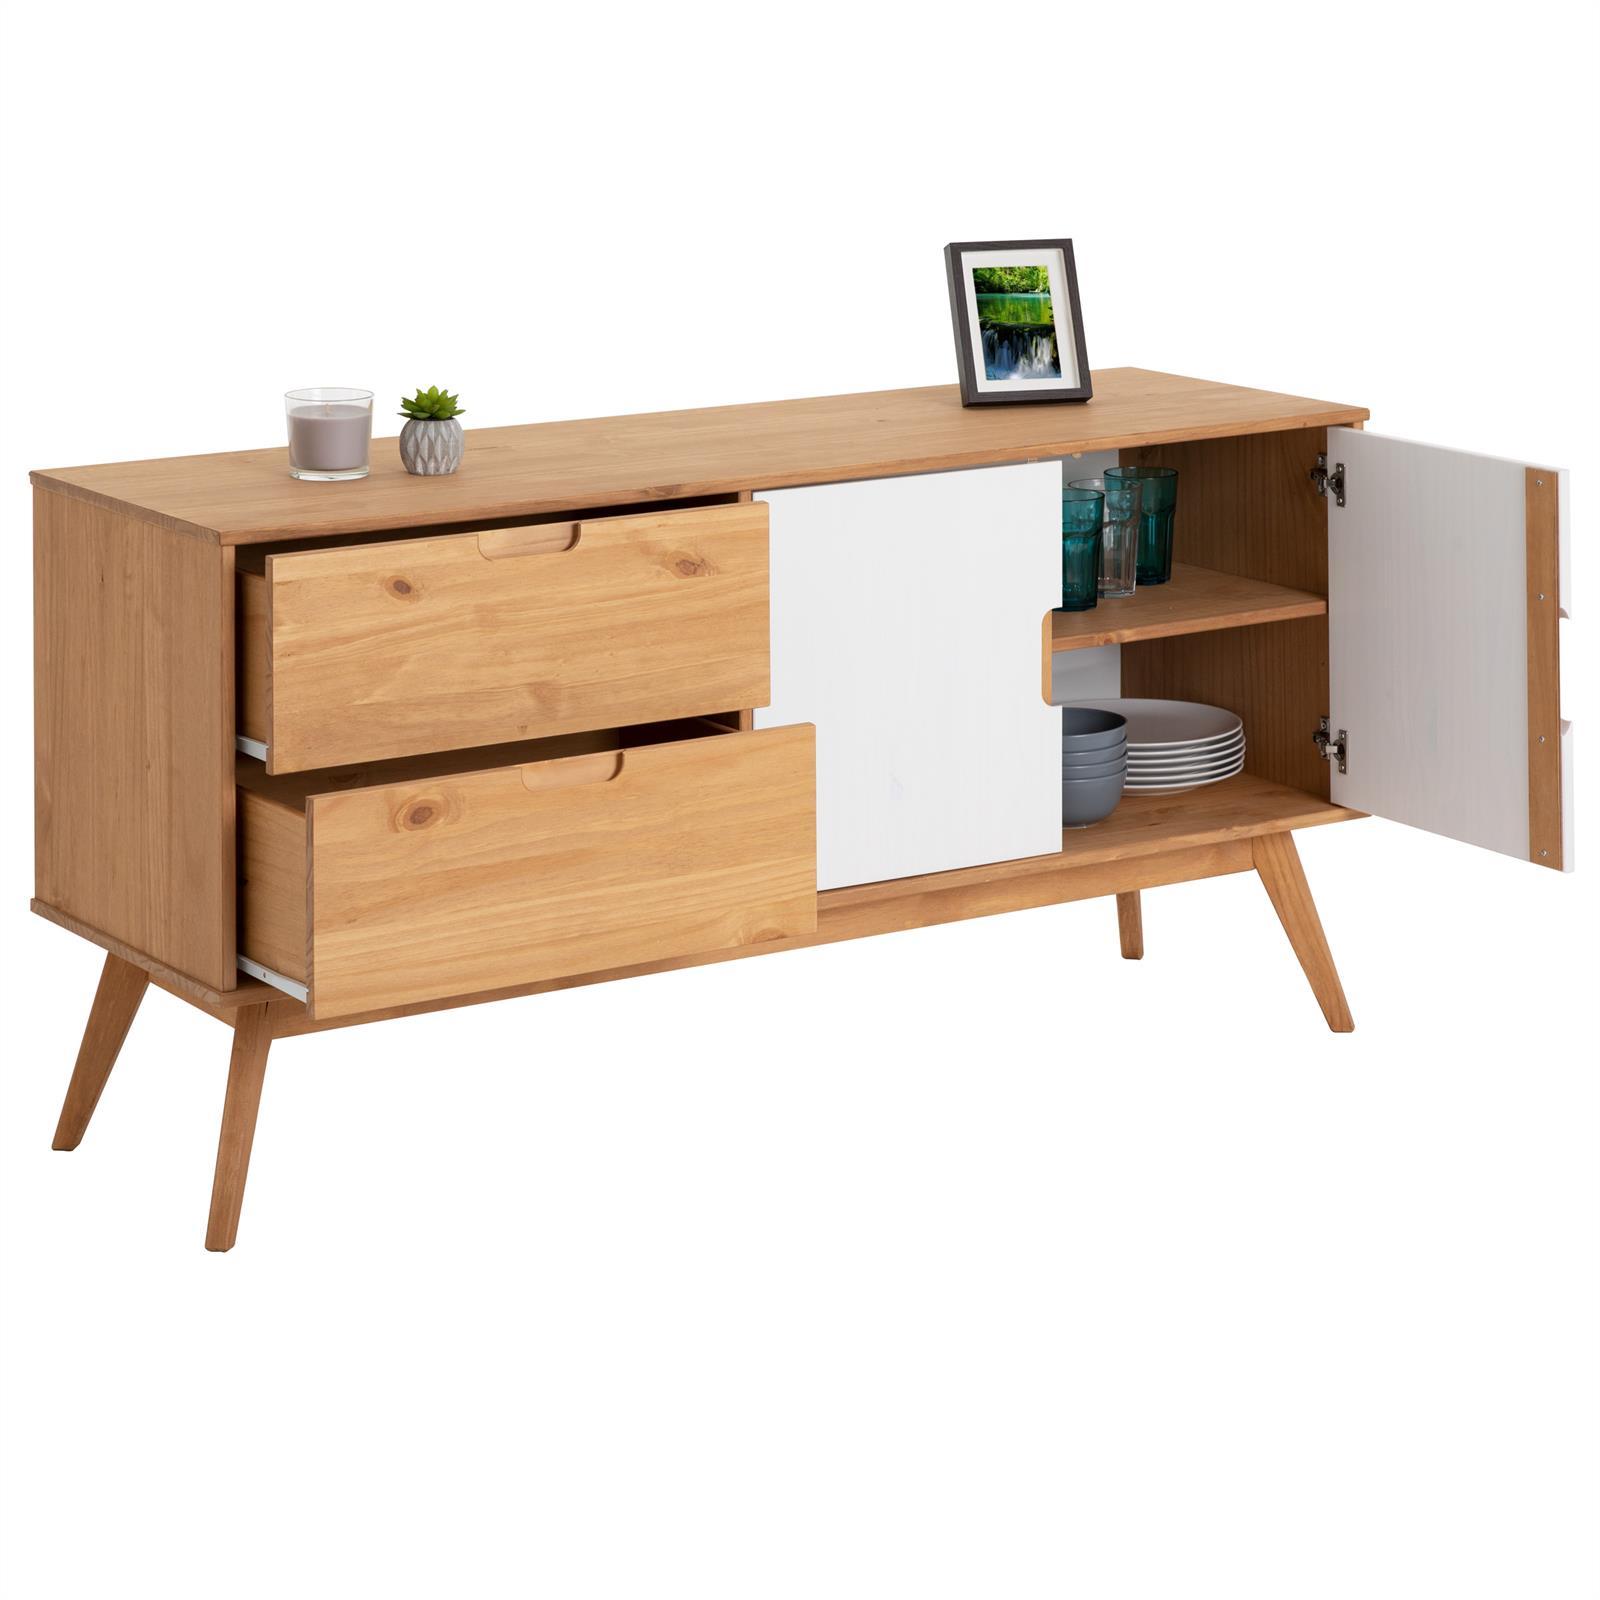 anrichte tivoli 2 t ren 2 schubladen skandinavisches design gebeizt wei mobilia24. Black Bedroom Furniture Sets. Home Design Ideas